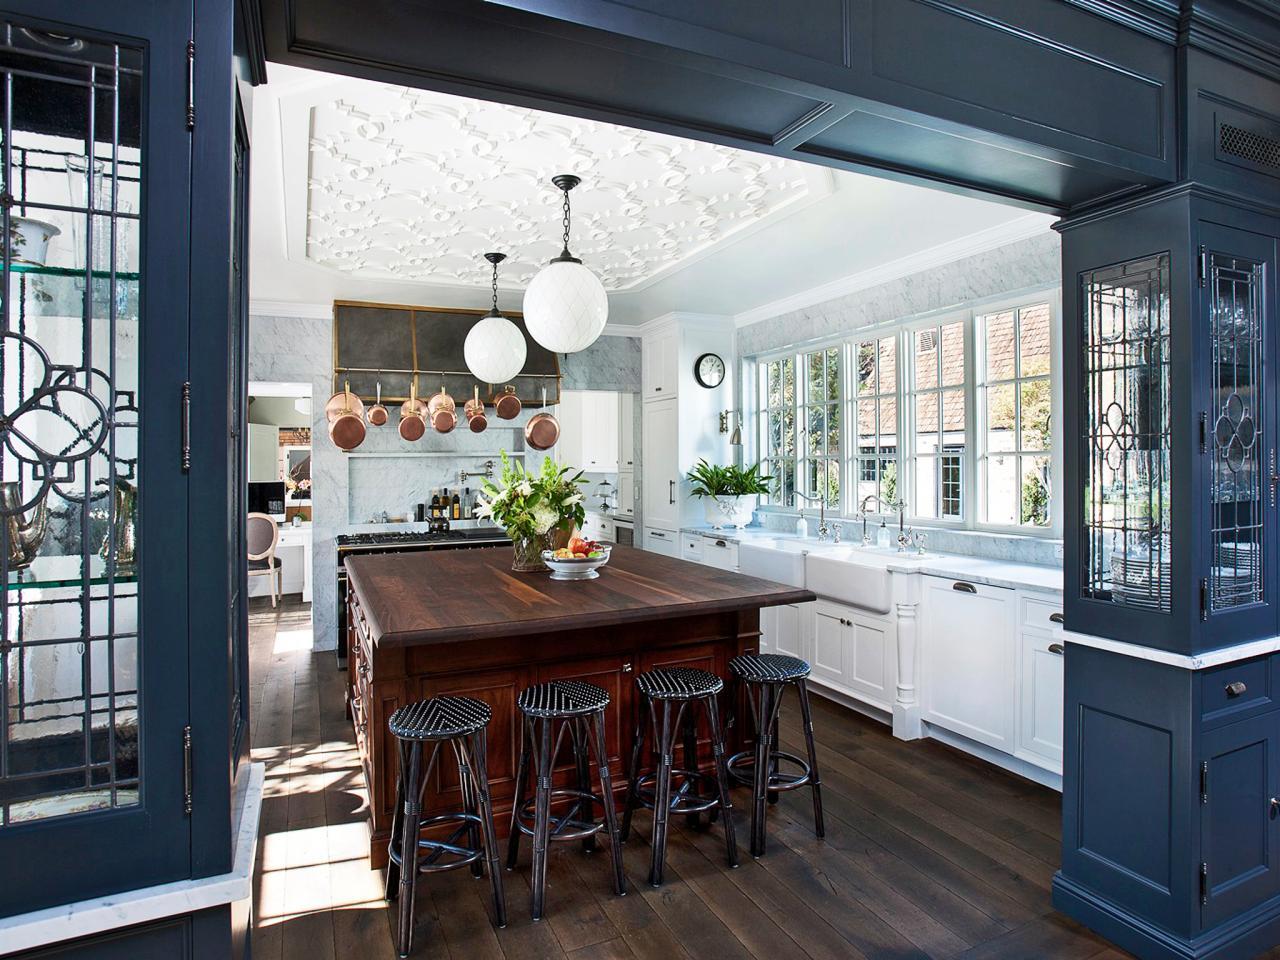 original_Candelaria-Design-traditional-white-kitchen-navy-cabinets.jpg.rend.hgtvcom.1280.960.jpeg